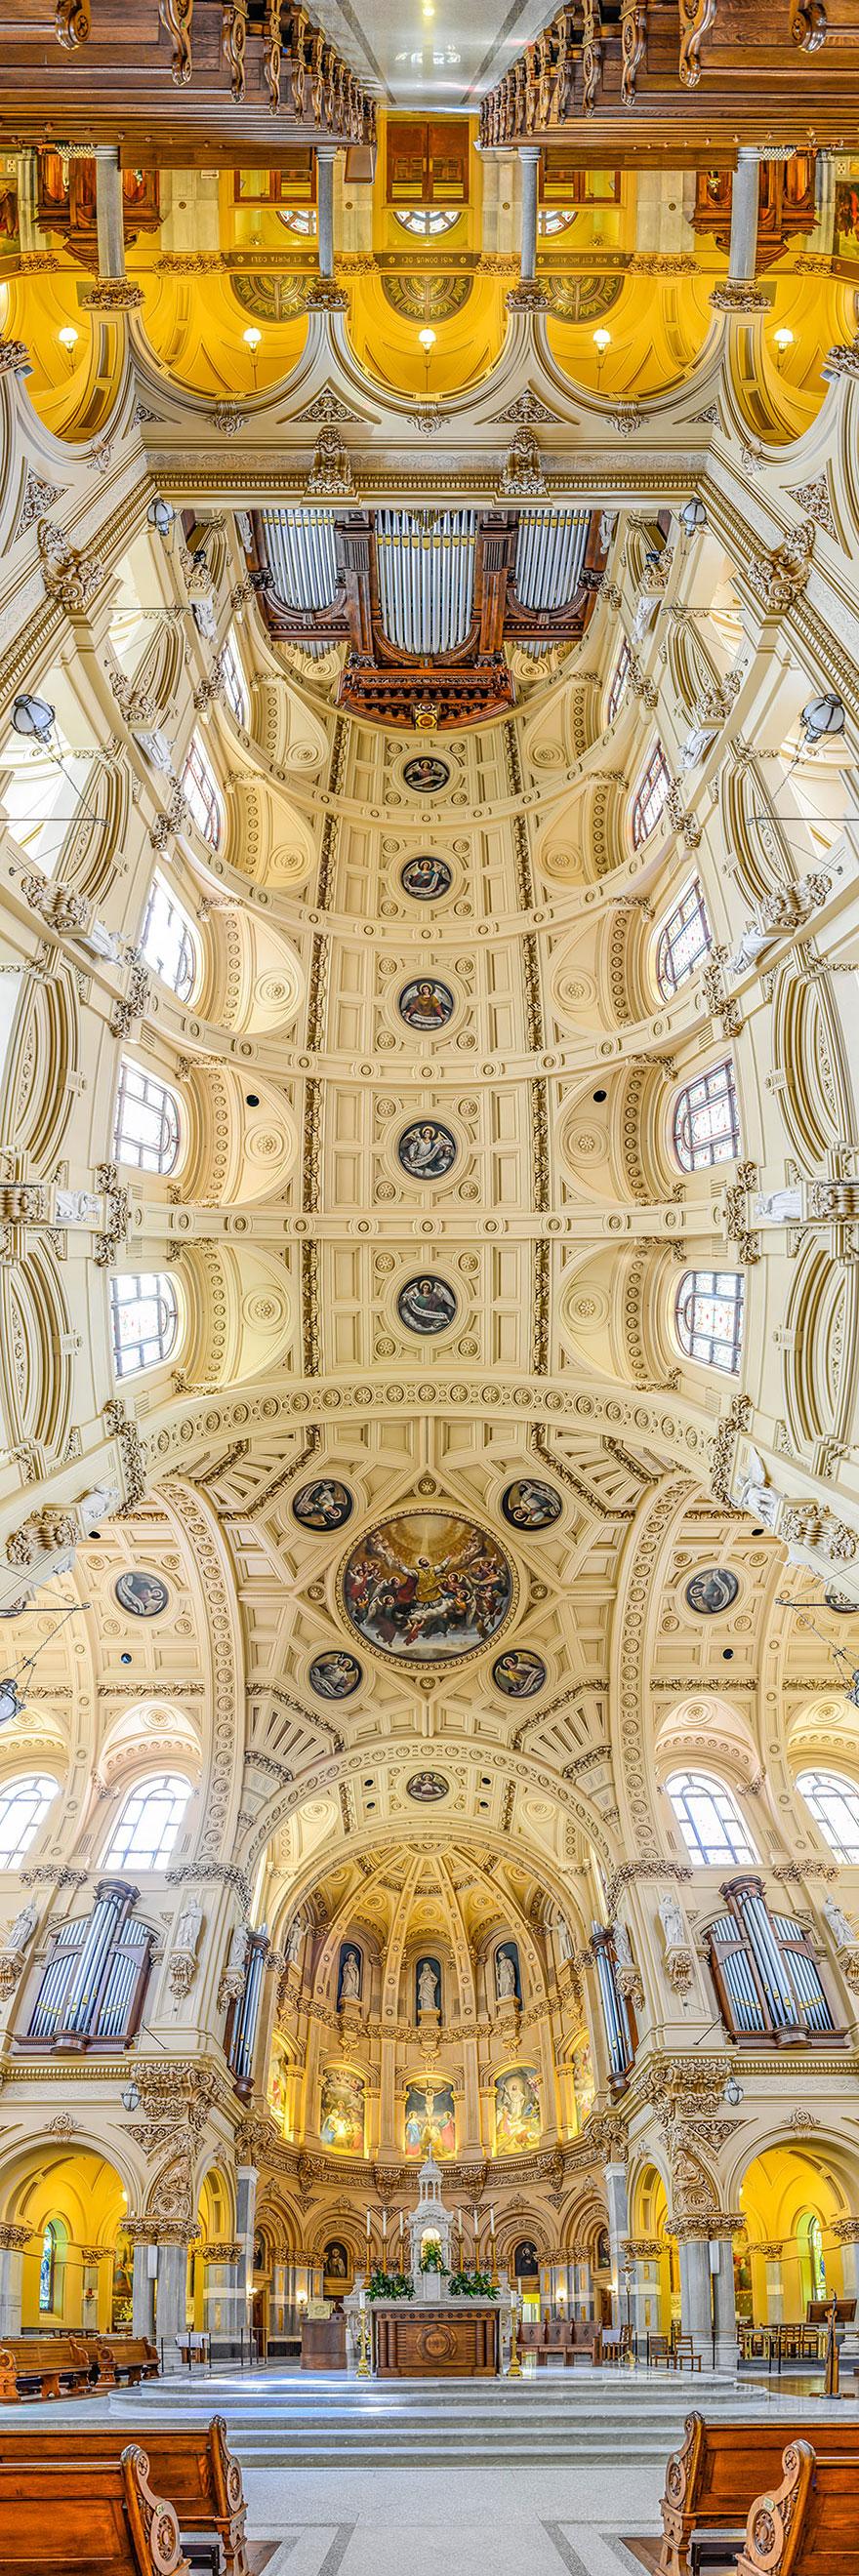 fotos-panoramicas-verticales-iglesias-nueva-york-richard-silver (7)